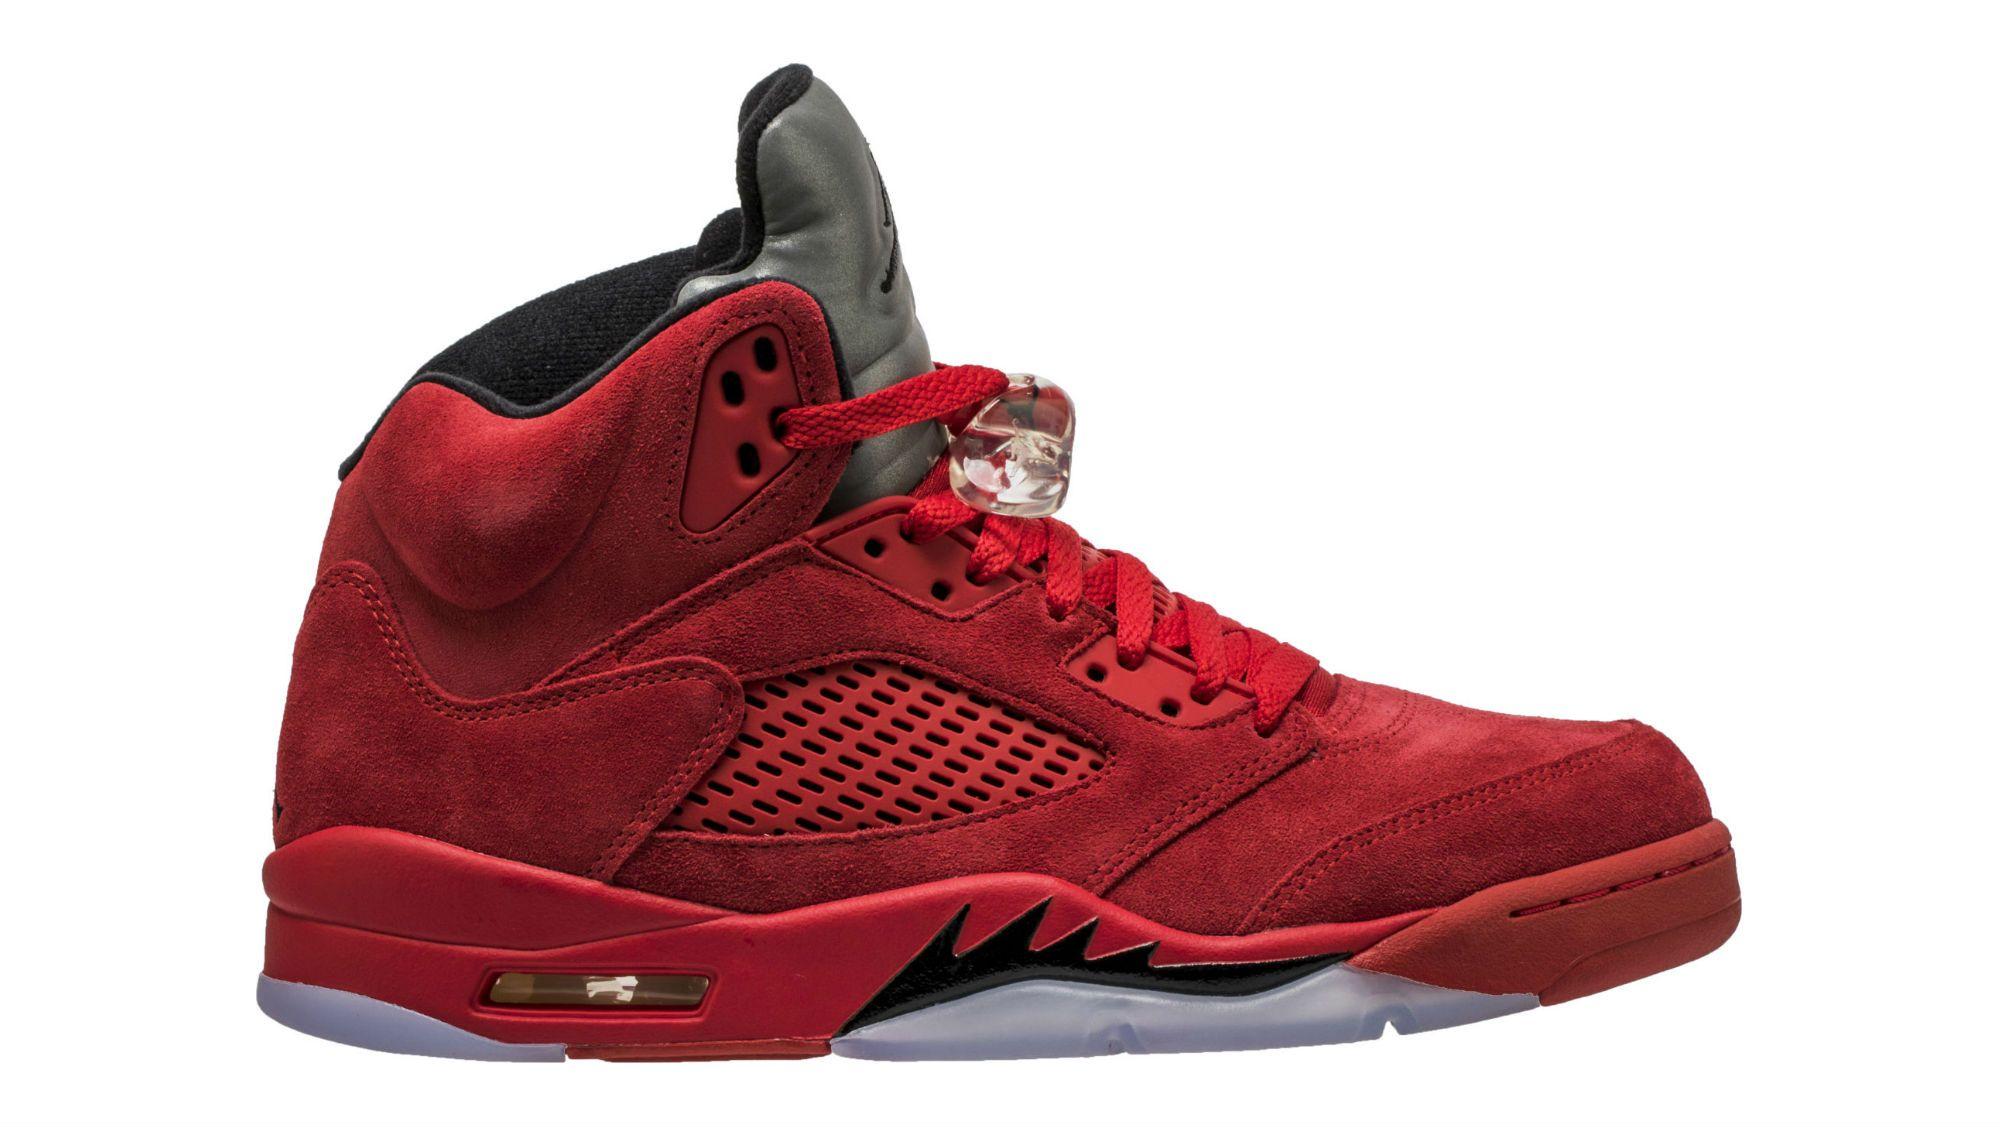 c1f148c55d36 Air Jordan 5 Retro University Red Black-University Red